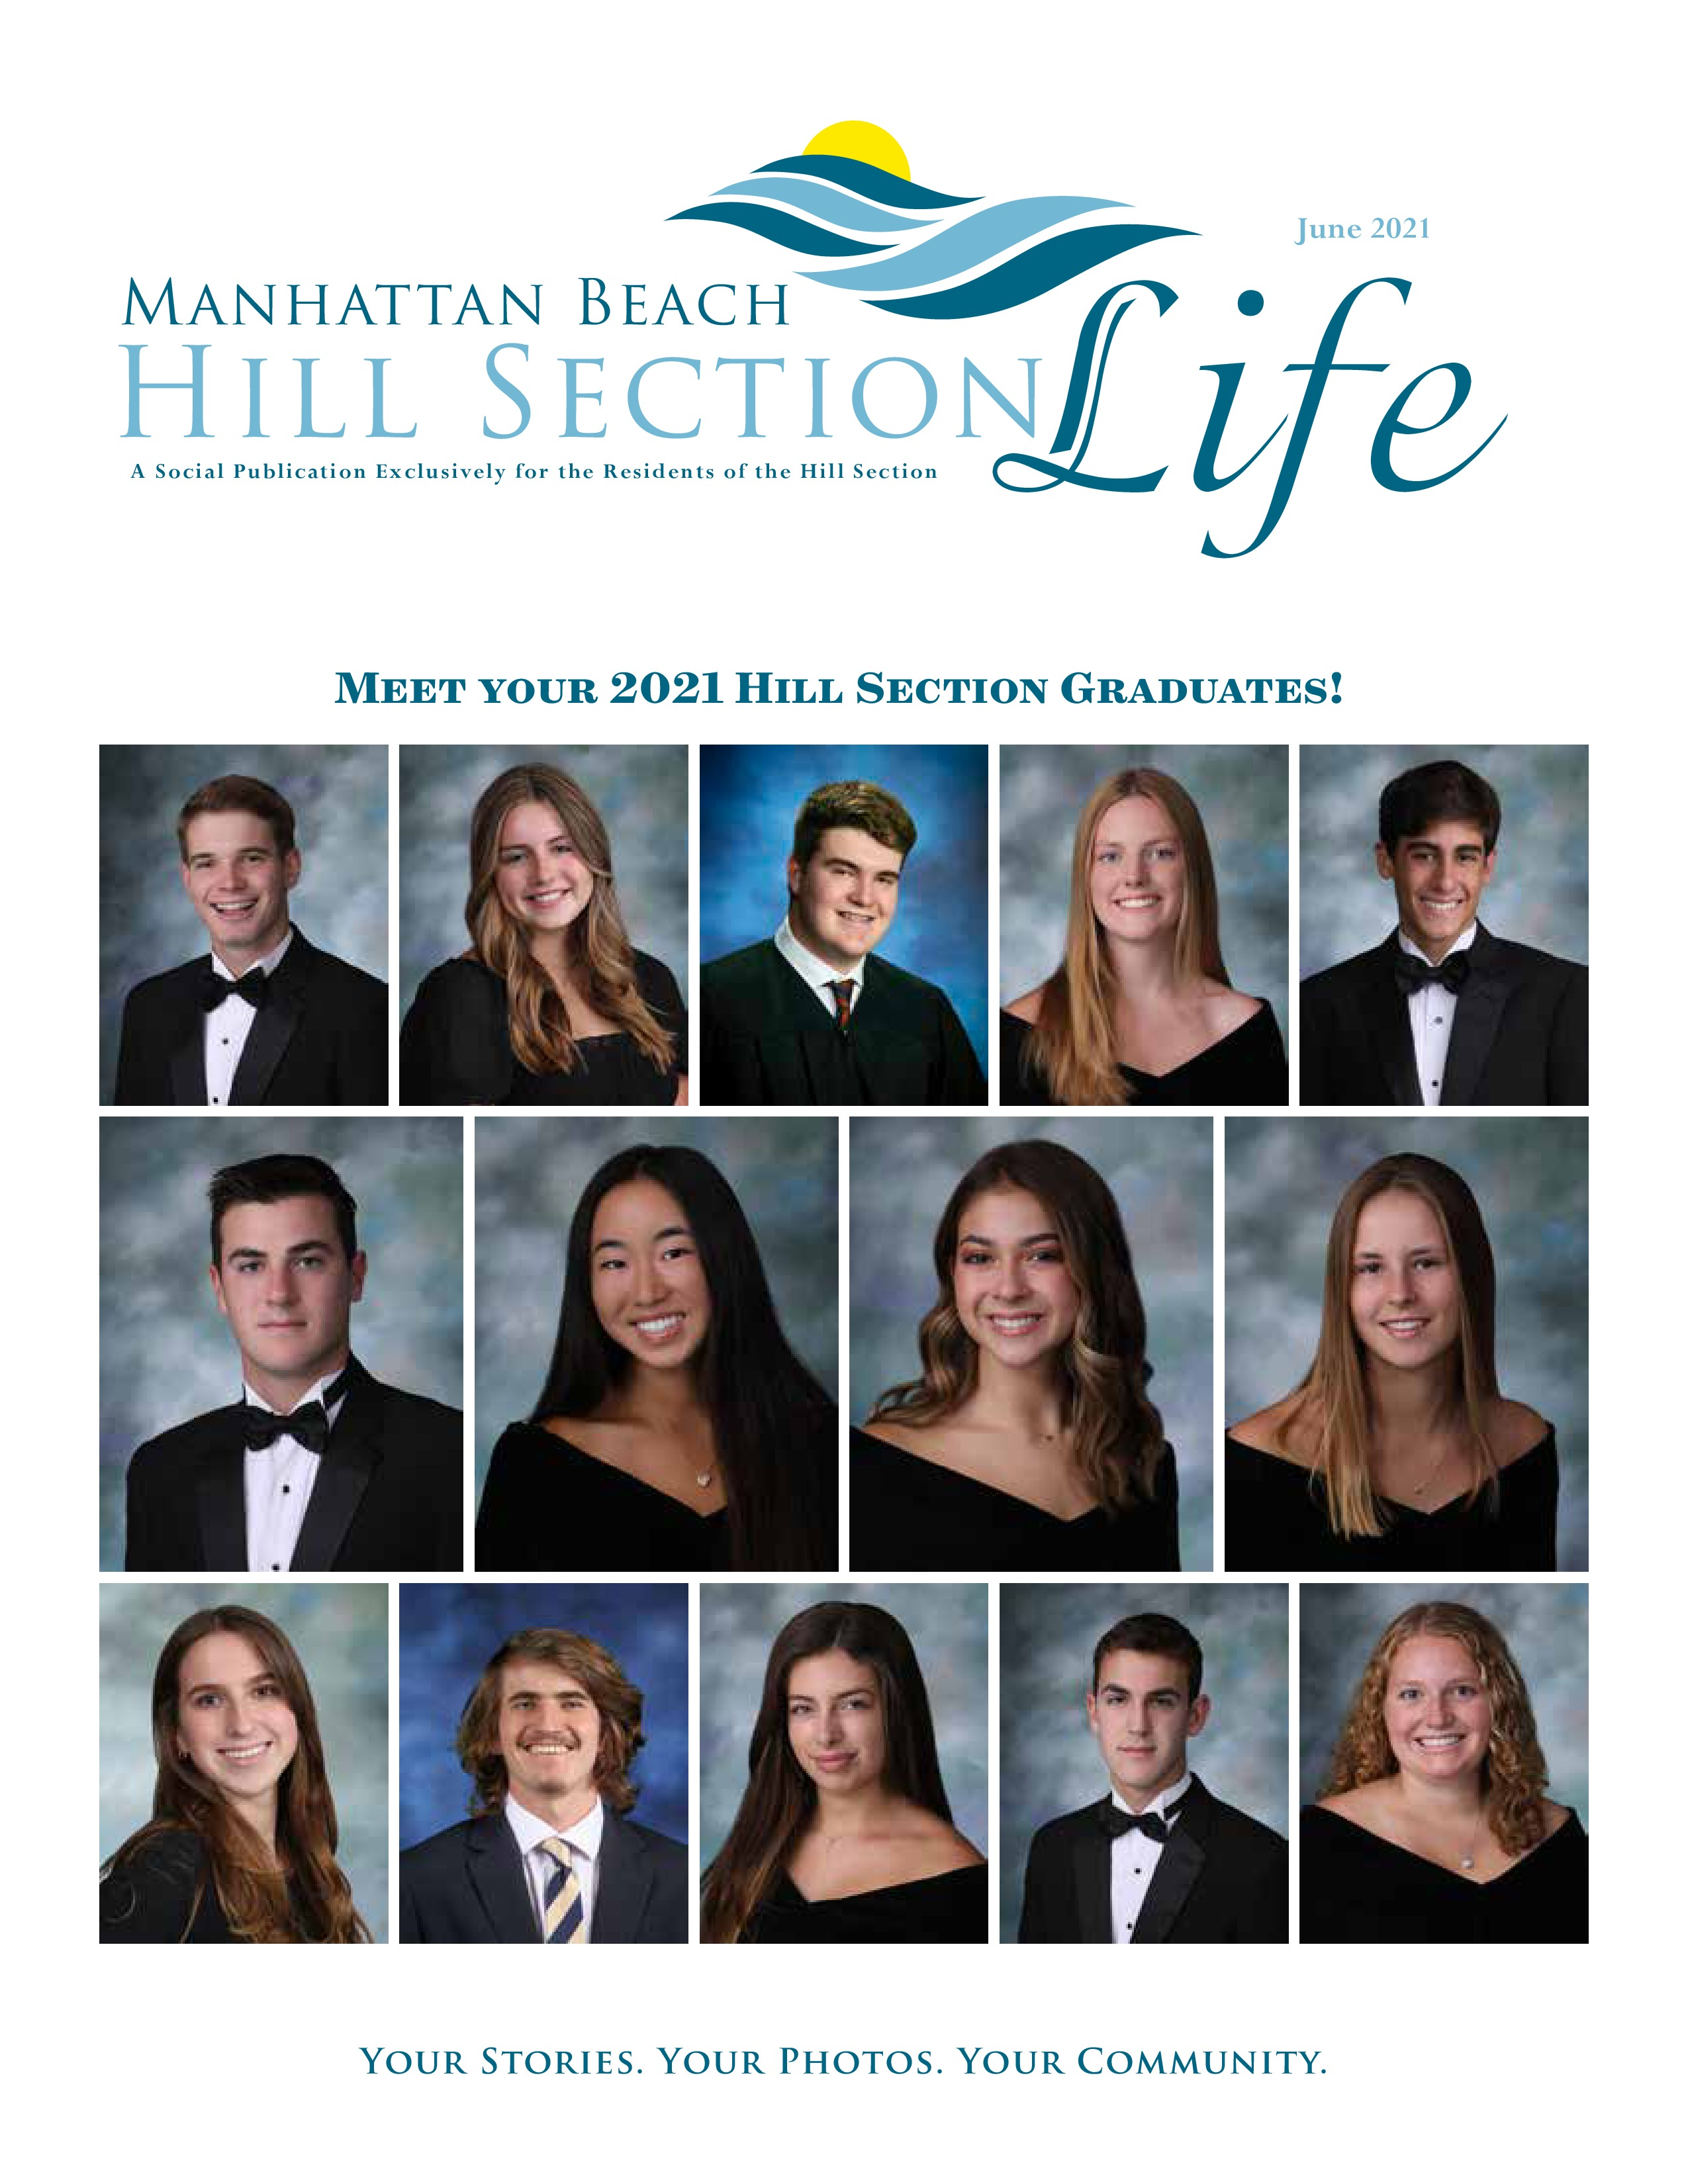 Manhattan Beach Hill Section Life 2021-06-01